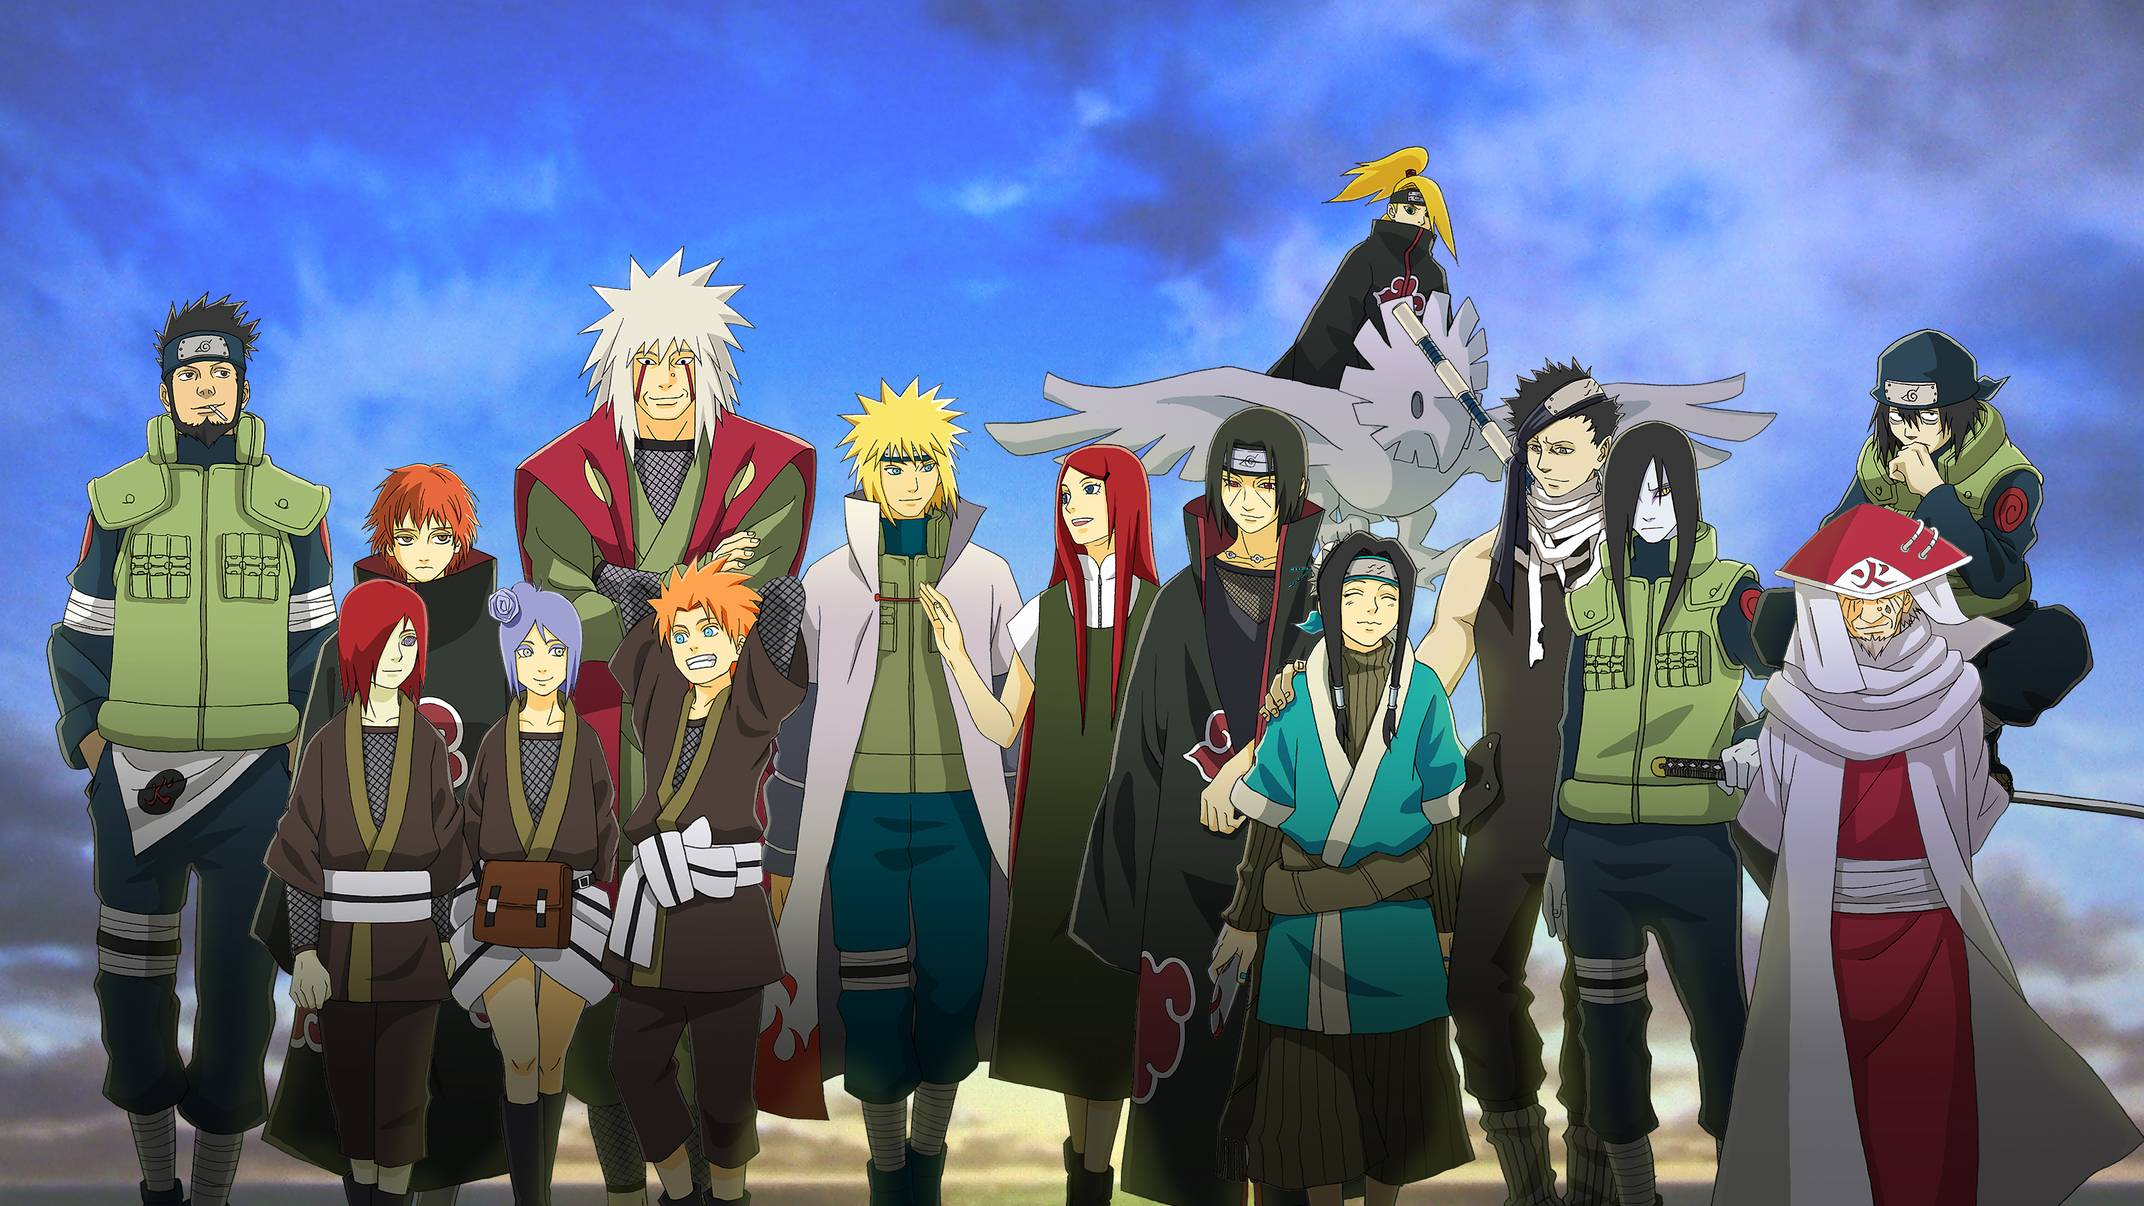 Most Inspiring Wallpaper Naruto Chromebook - ubhTacS  Trends_798710.jpg